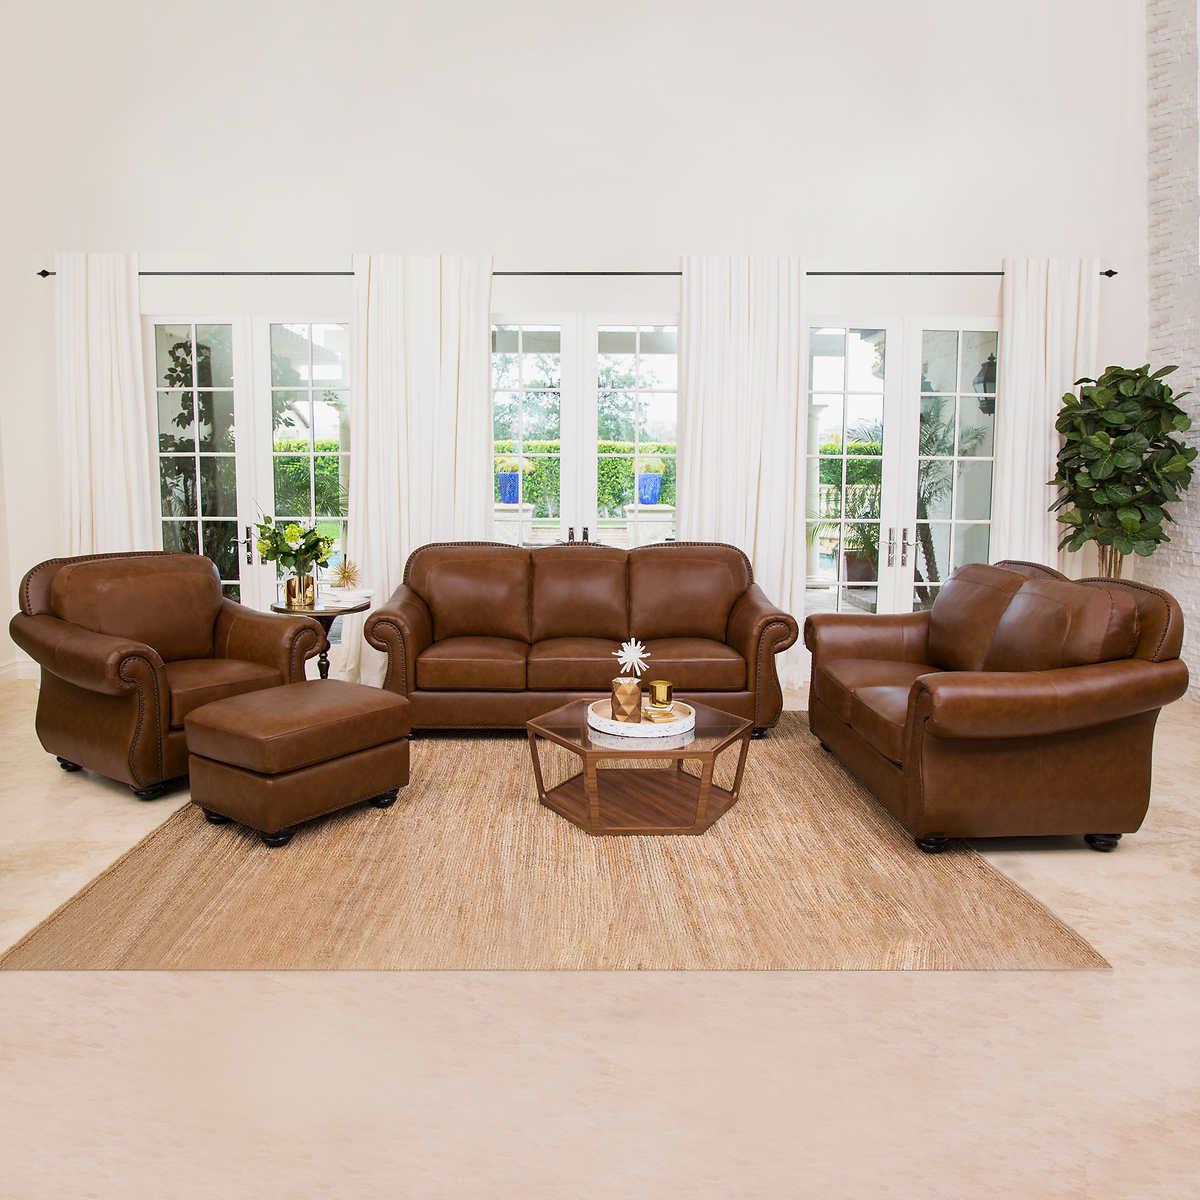 Clarke 4-piece Top Grain Leather Living Room Set